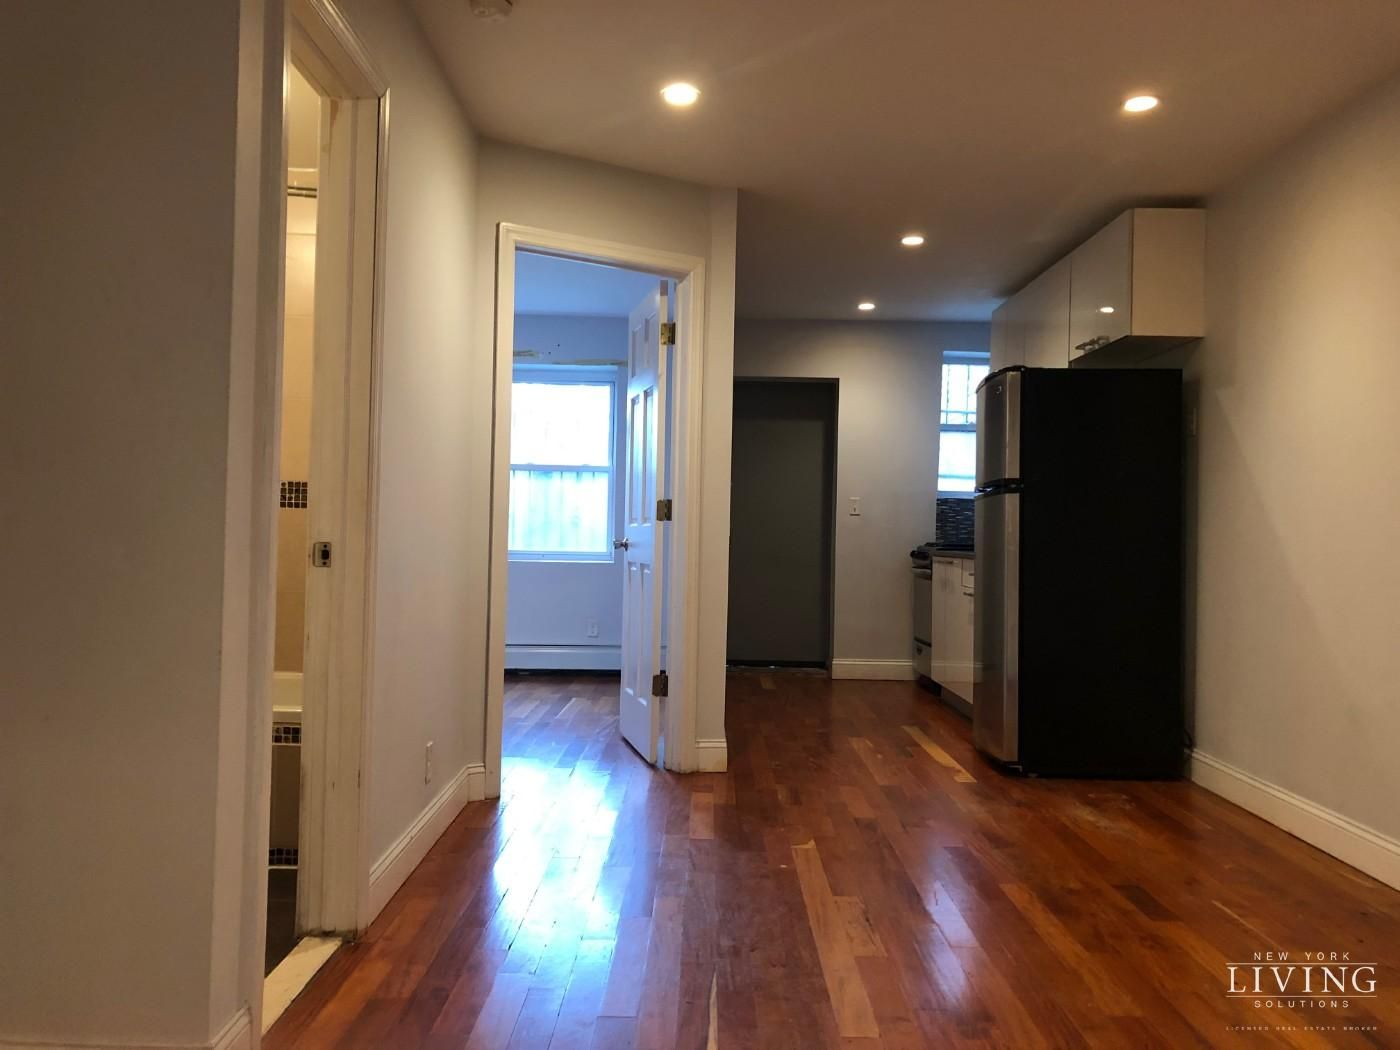 Brooklyn Apartments Bedford Stuyvesant 2 Bedroom Apartment For Rent Brooklyn Apartments For Rent Brooklyn Apartment Apartments For Rent